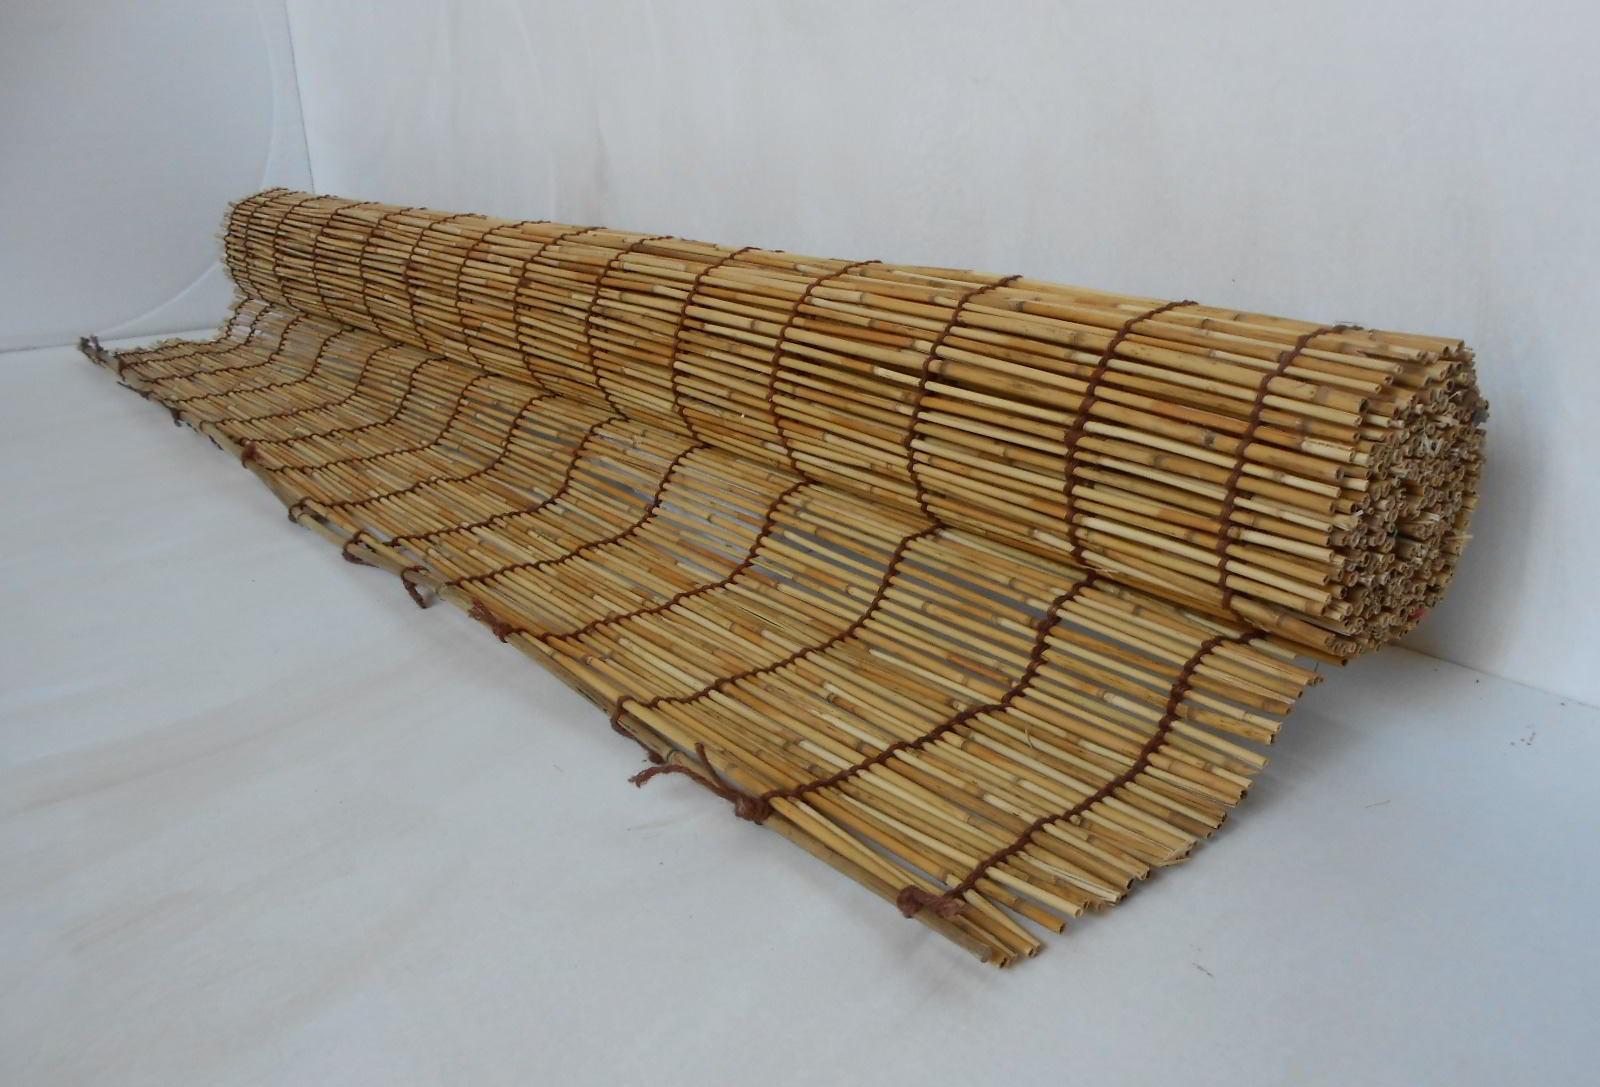 Coperture Per Recinzioni Giardino.Arelle In Bambu Arelle Di Bambu Canne Di Bamboo Stuoie Bambu